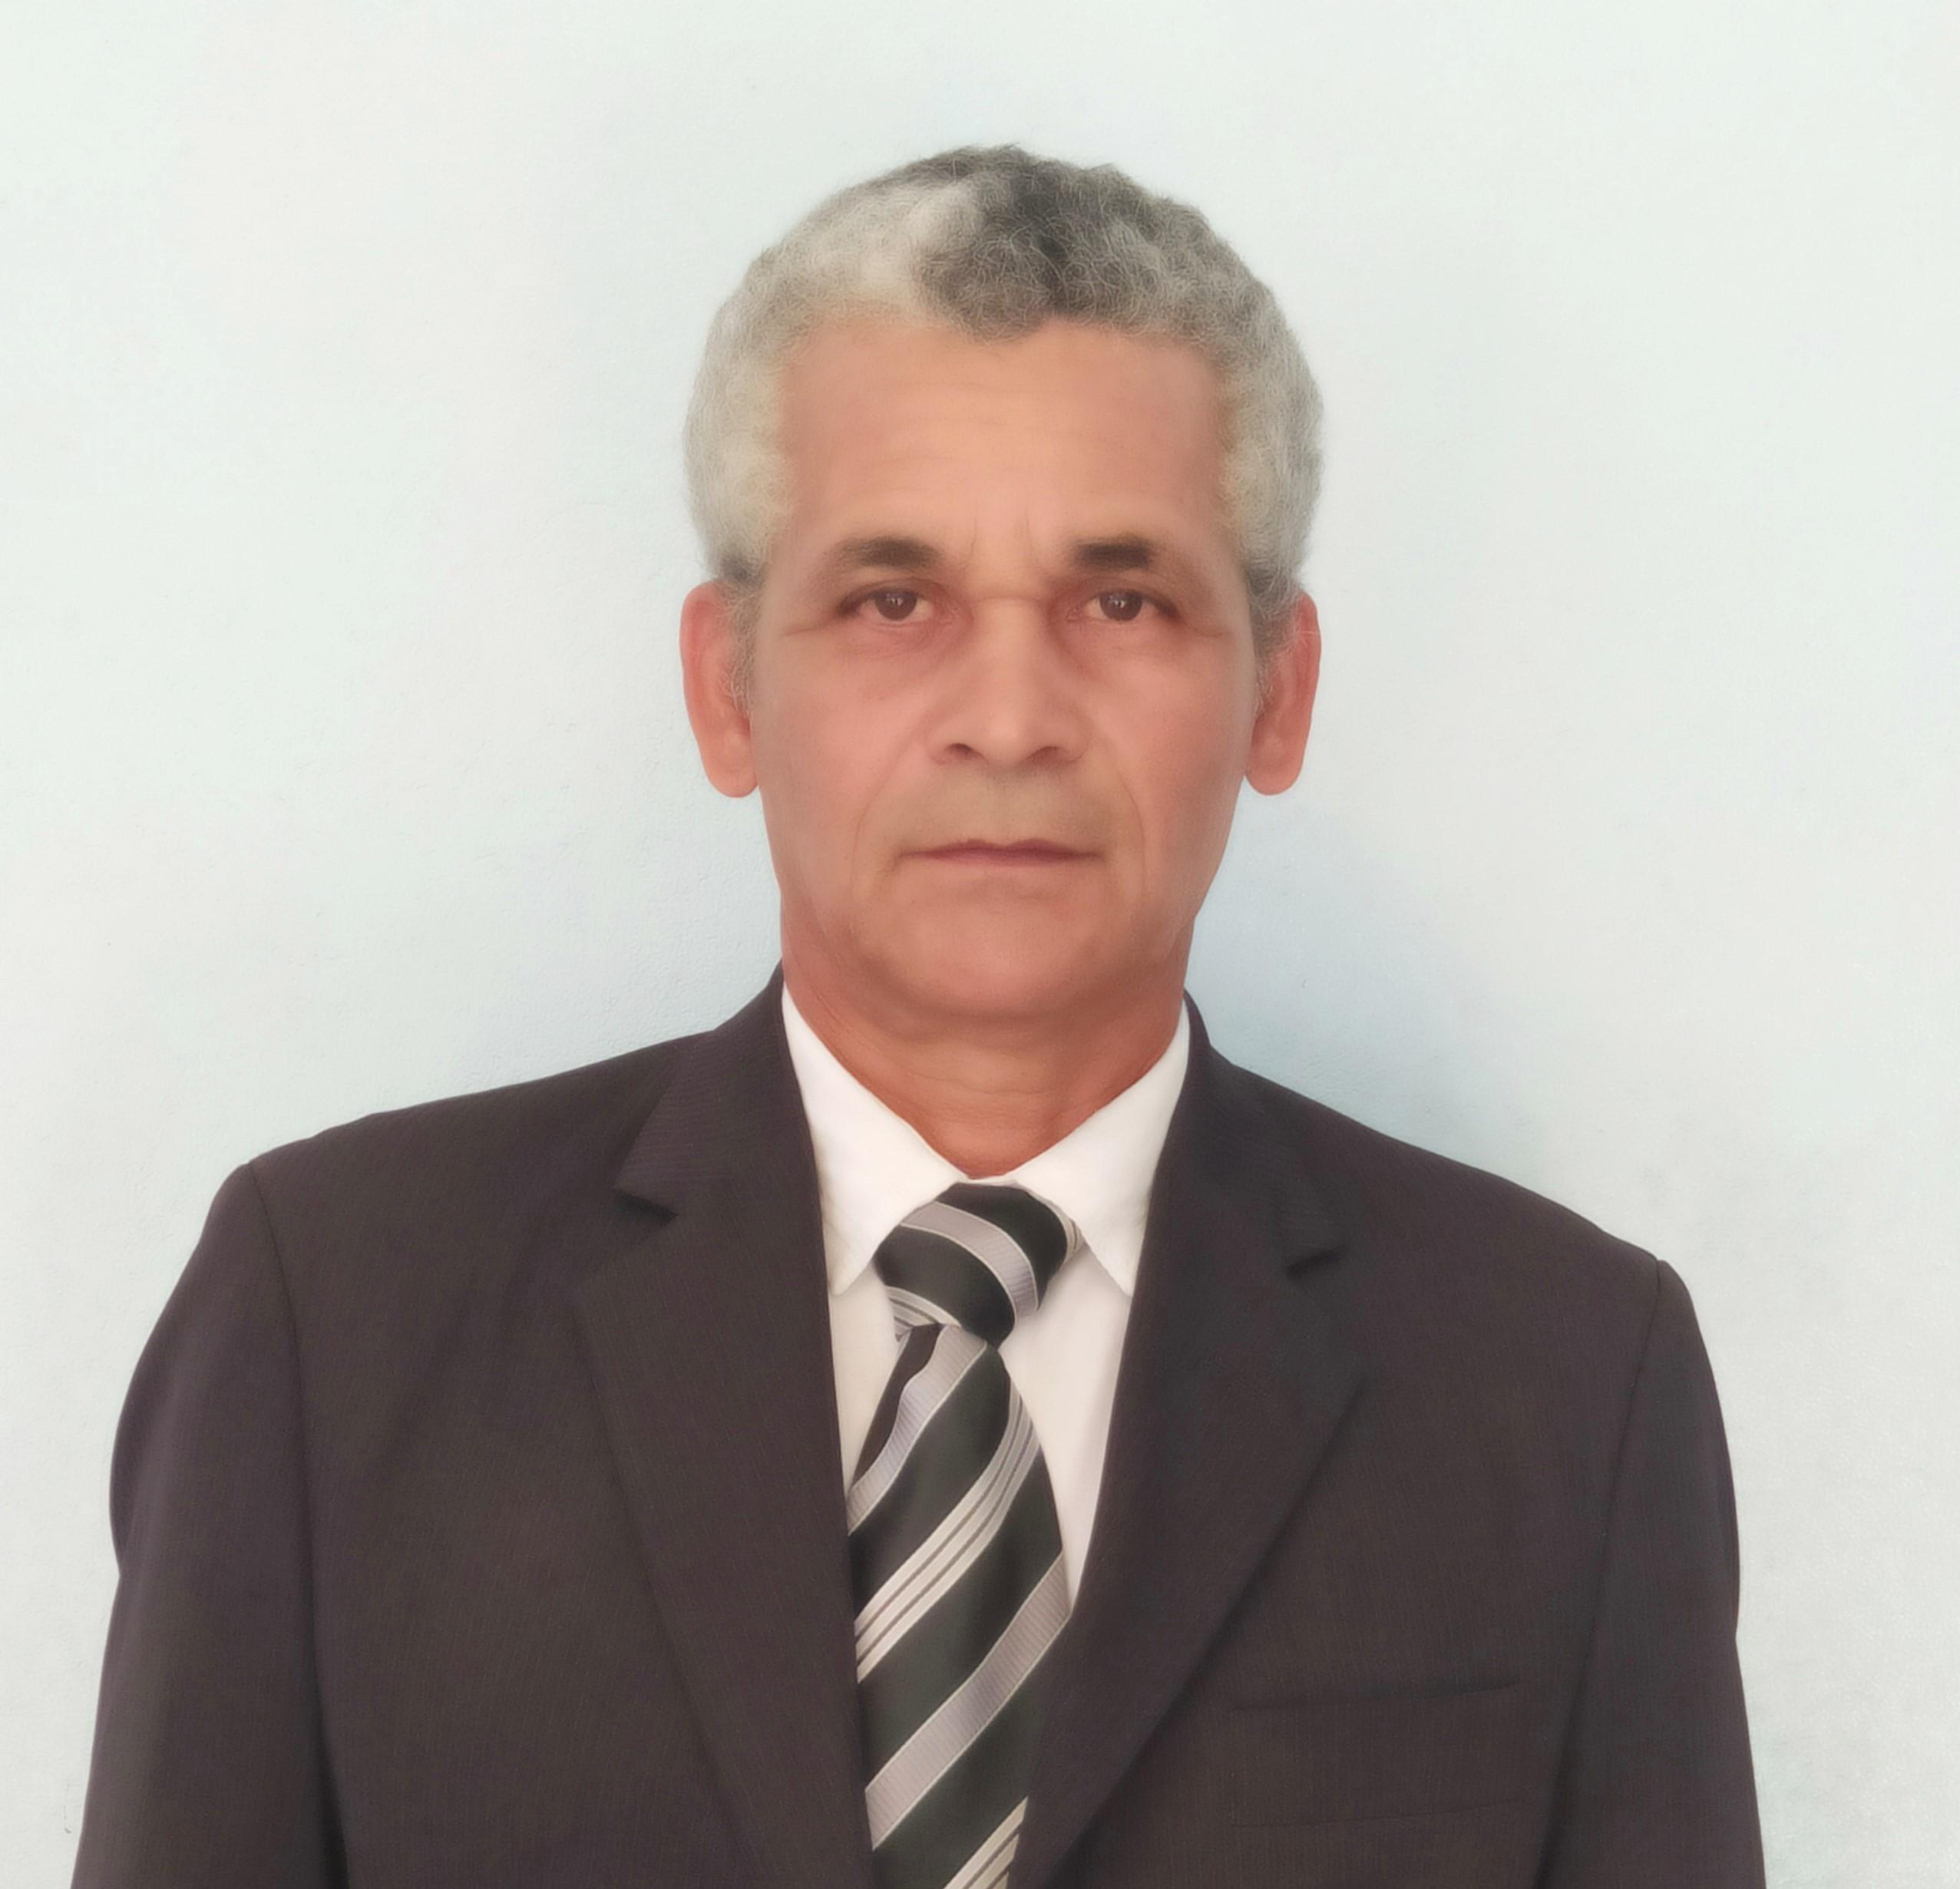 Entrevista com Isael Costa